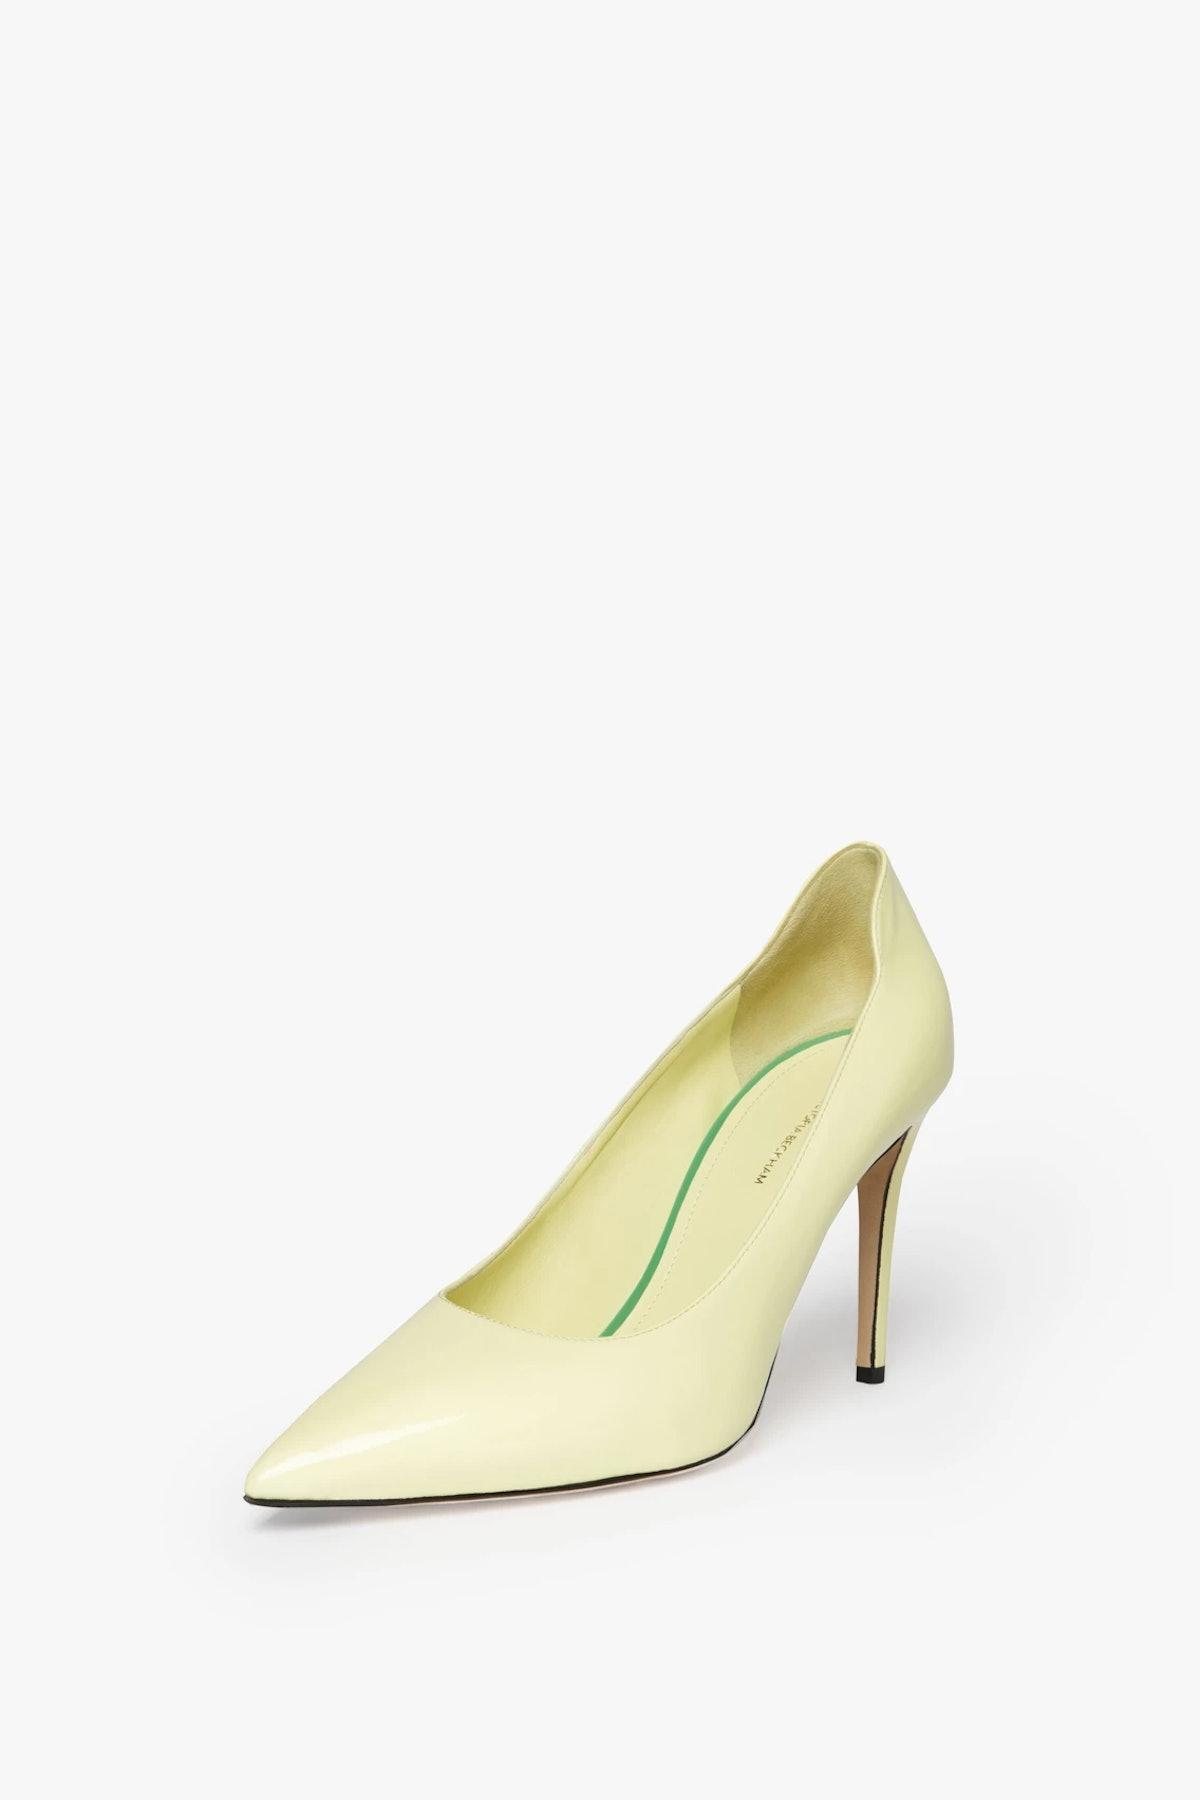 Victoria Beckham's pale yellow pumps.